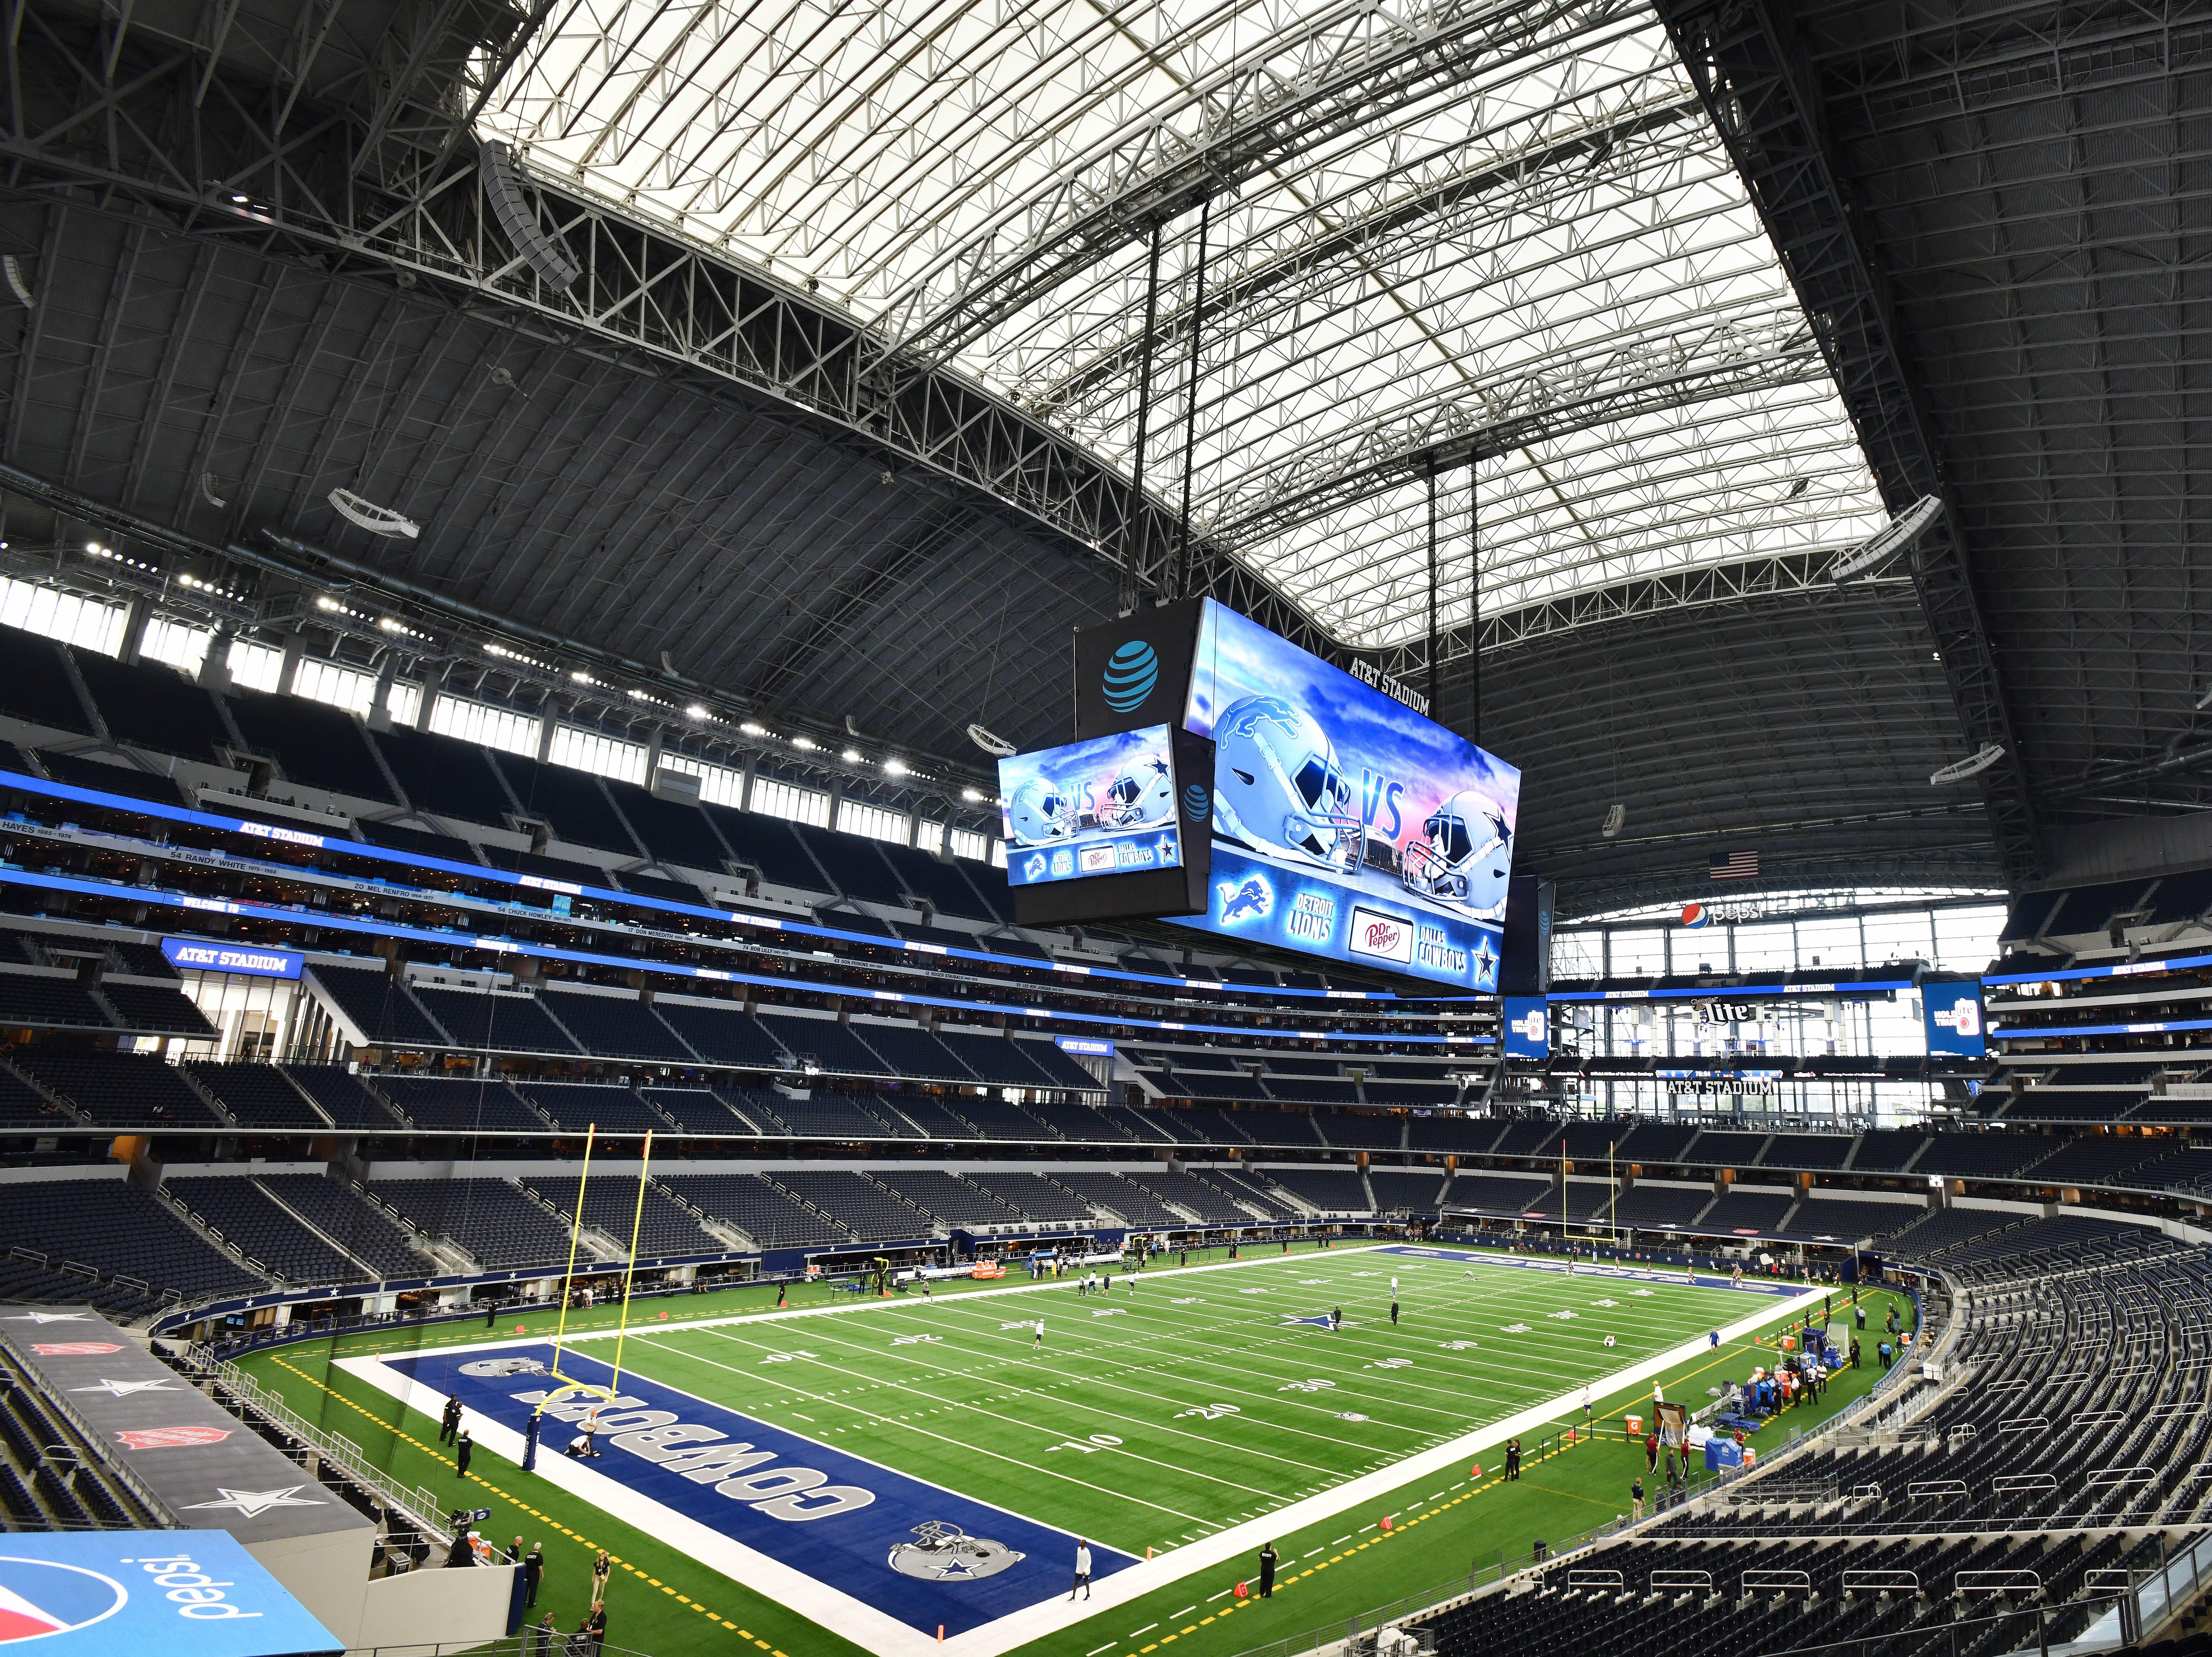 NFL Detroit Lions vs. Dallas Cowboys at AT&T Stadium in Arlington, Texas on September 30, 2018.